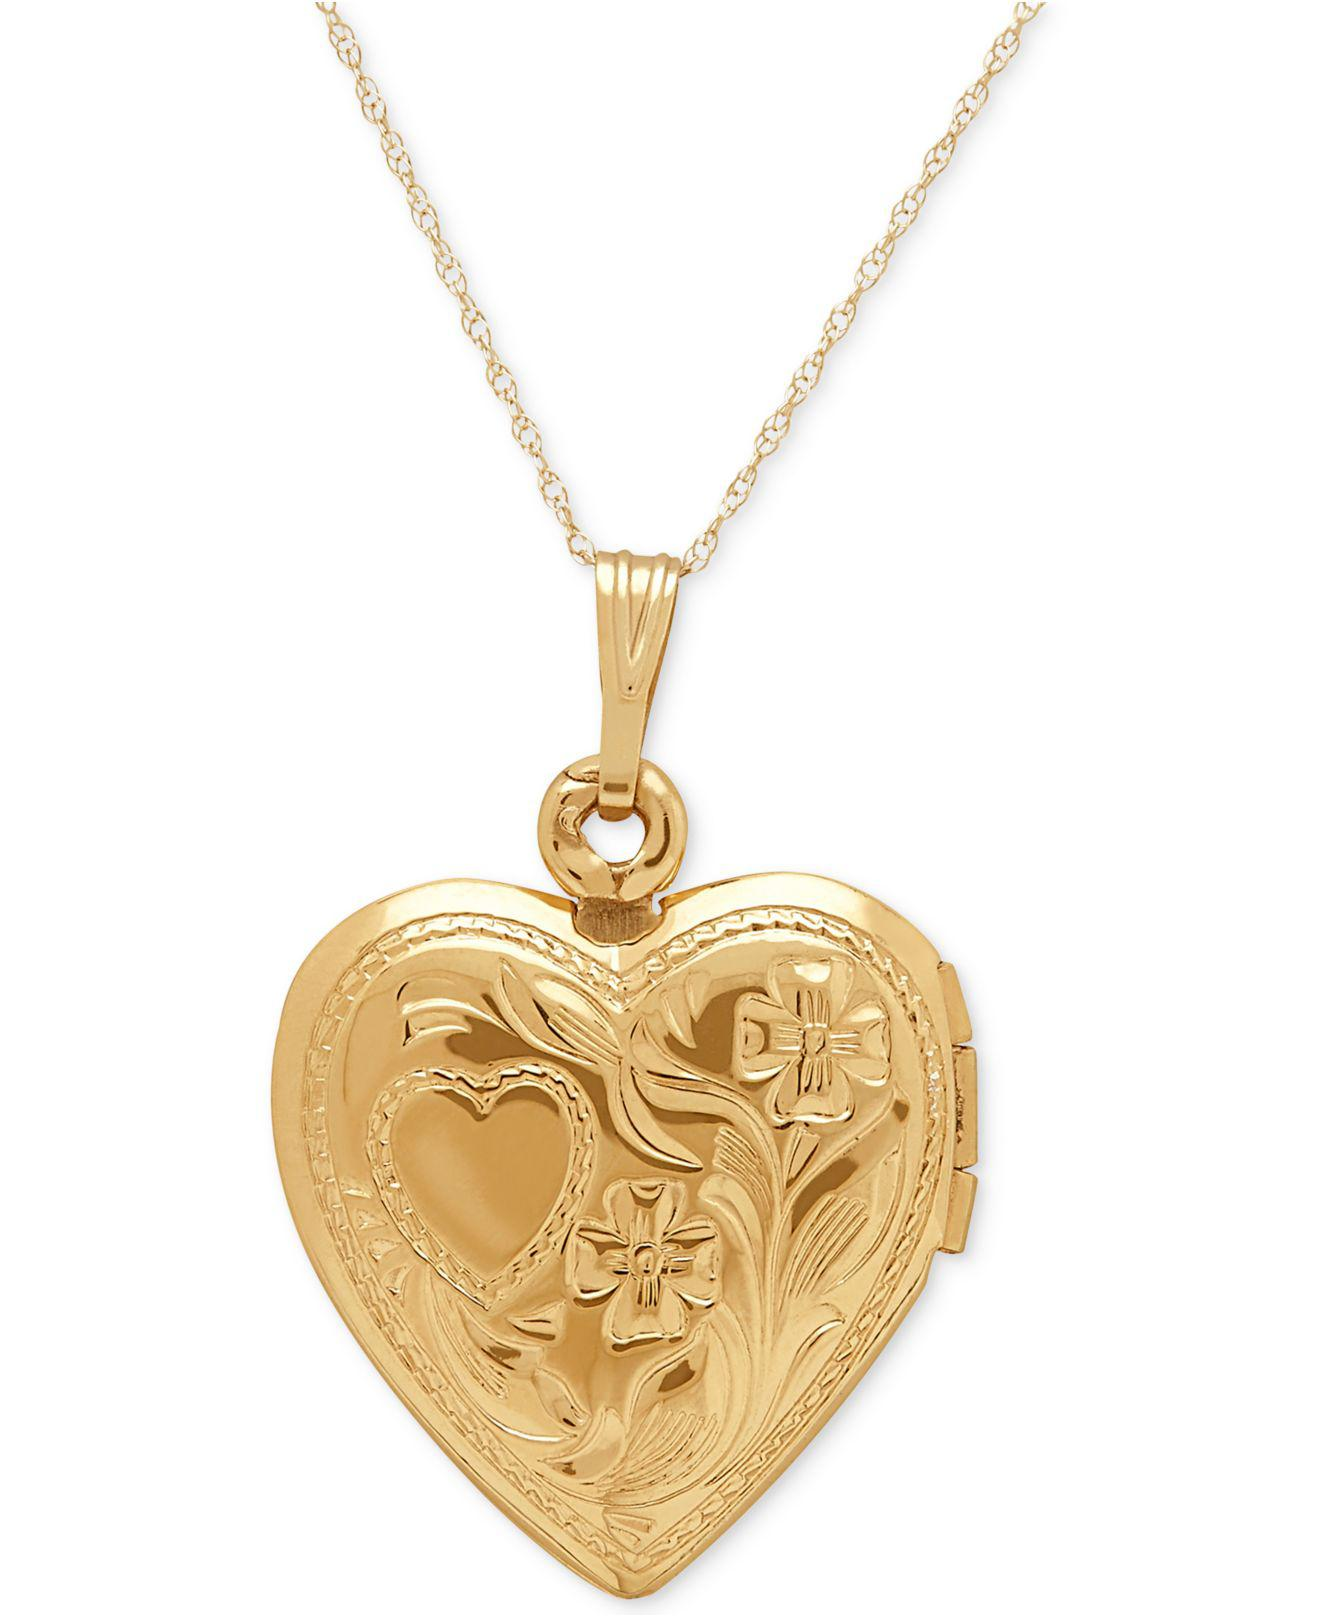 Lyst macys engraved heart locket pendant necklace in 10k gold in lyst macys engraved heart locket pendant necklace in 10k gold in metallic aloadofball Choice Image